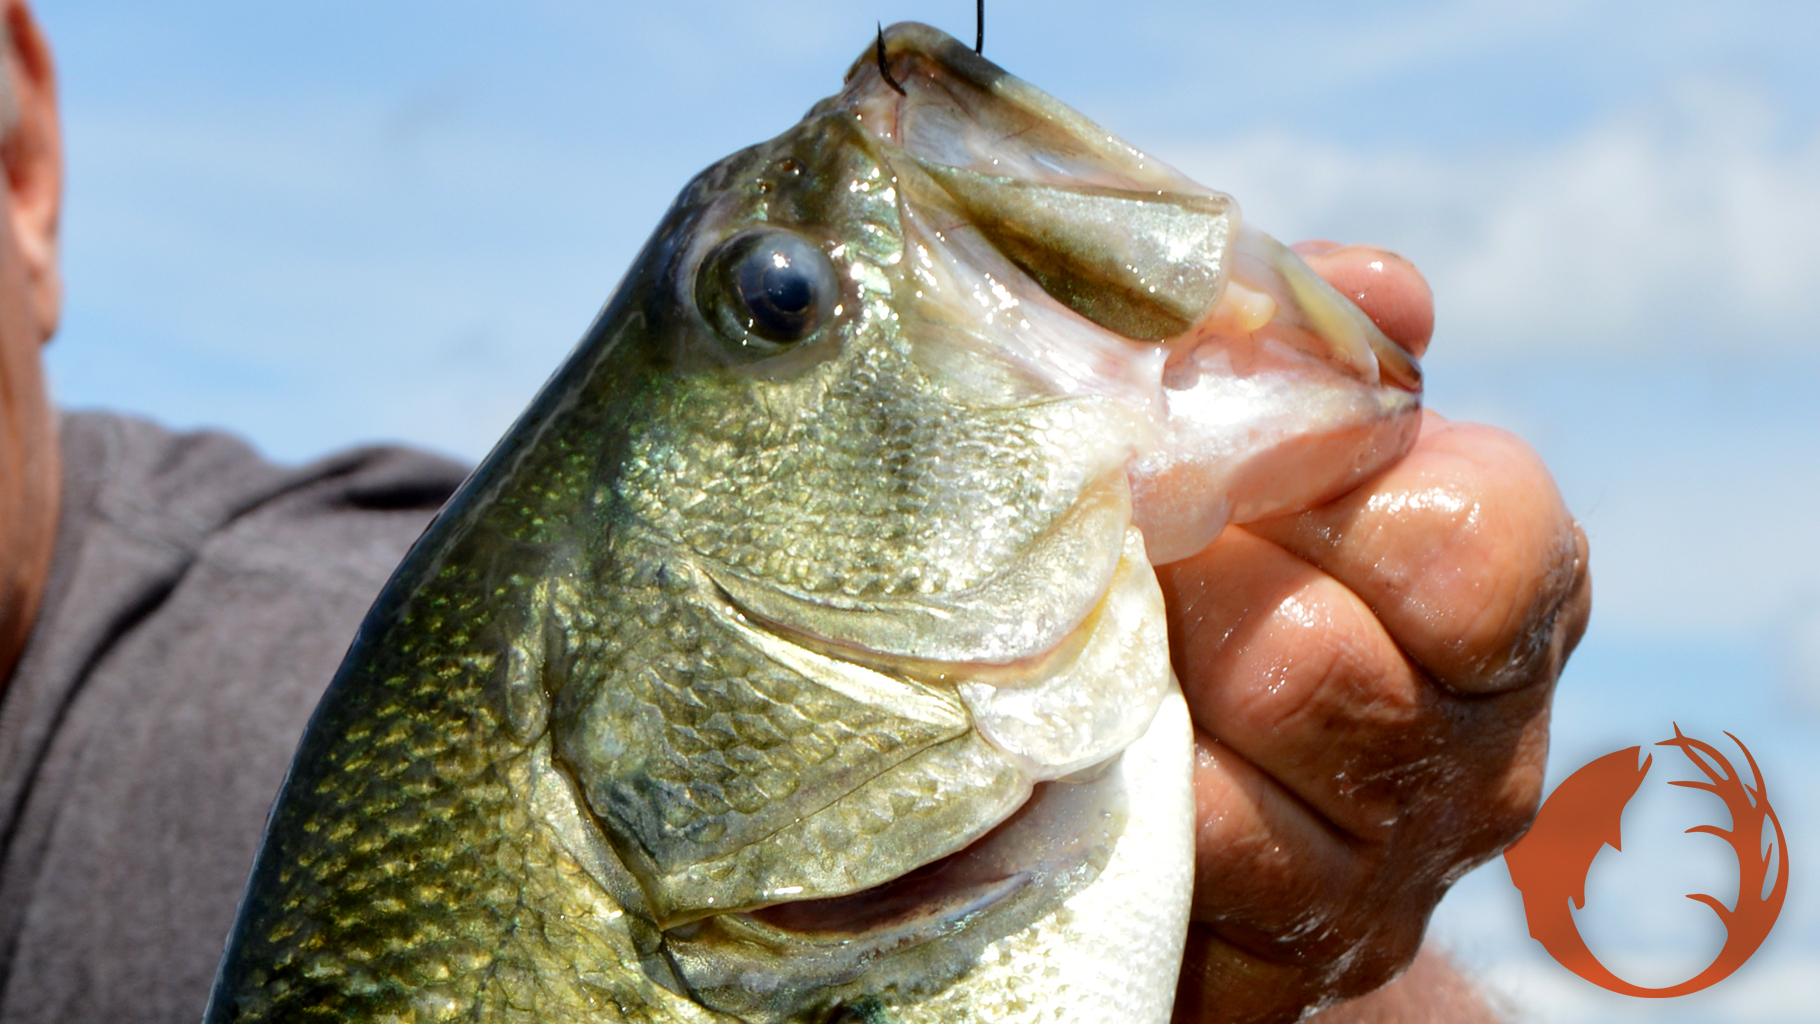 Catch Fish On The Weedline